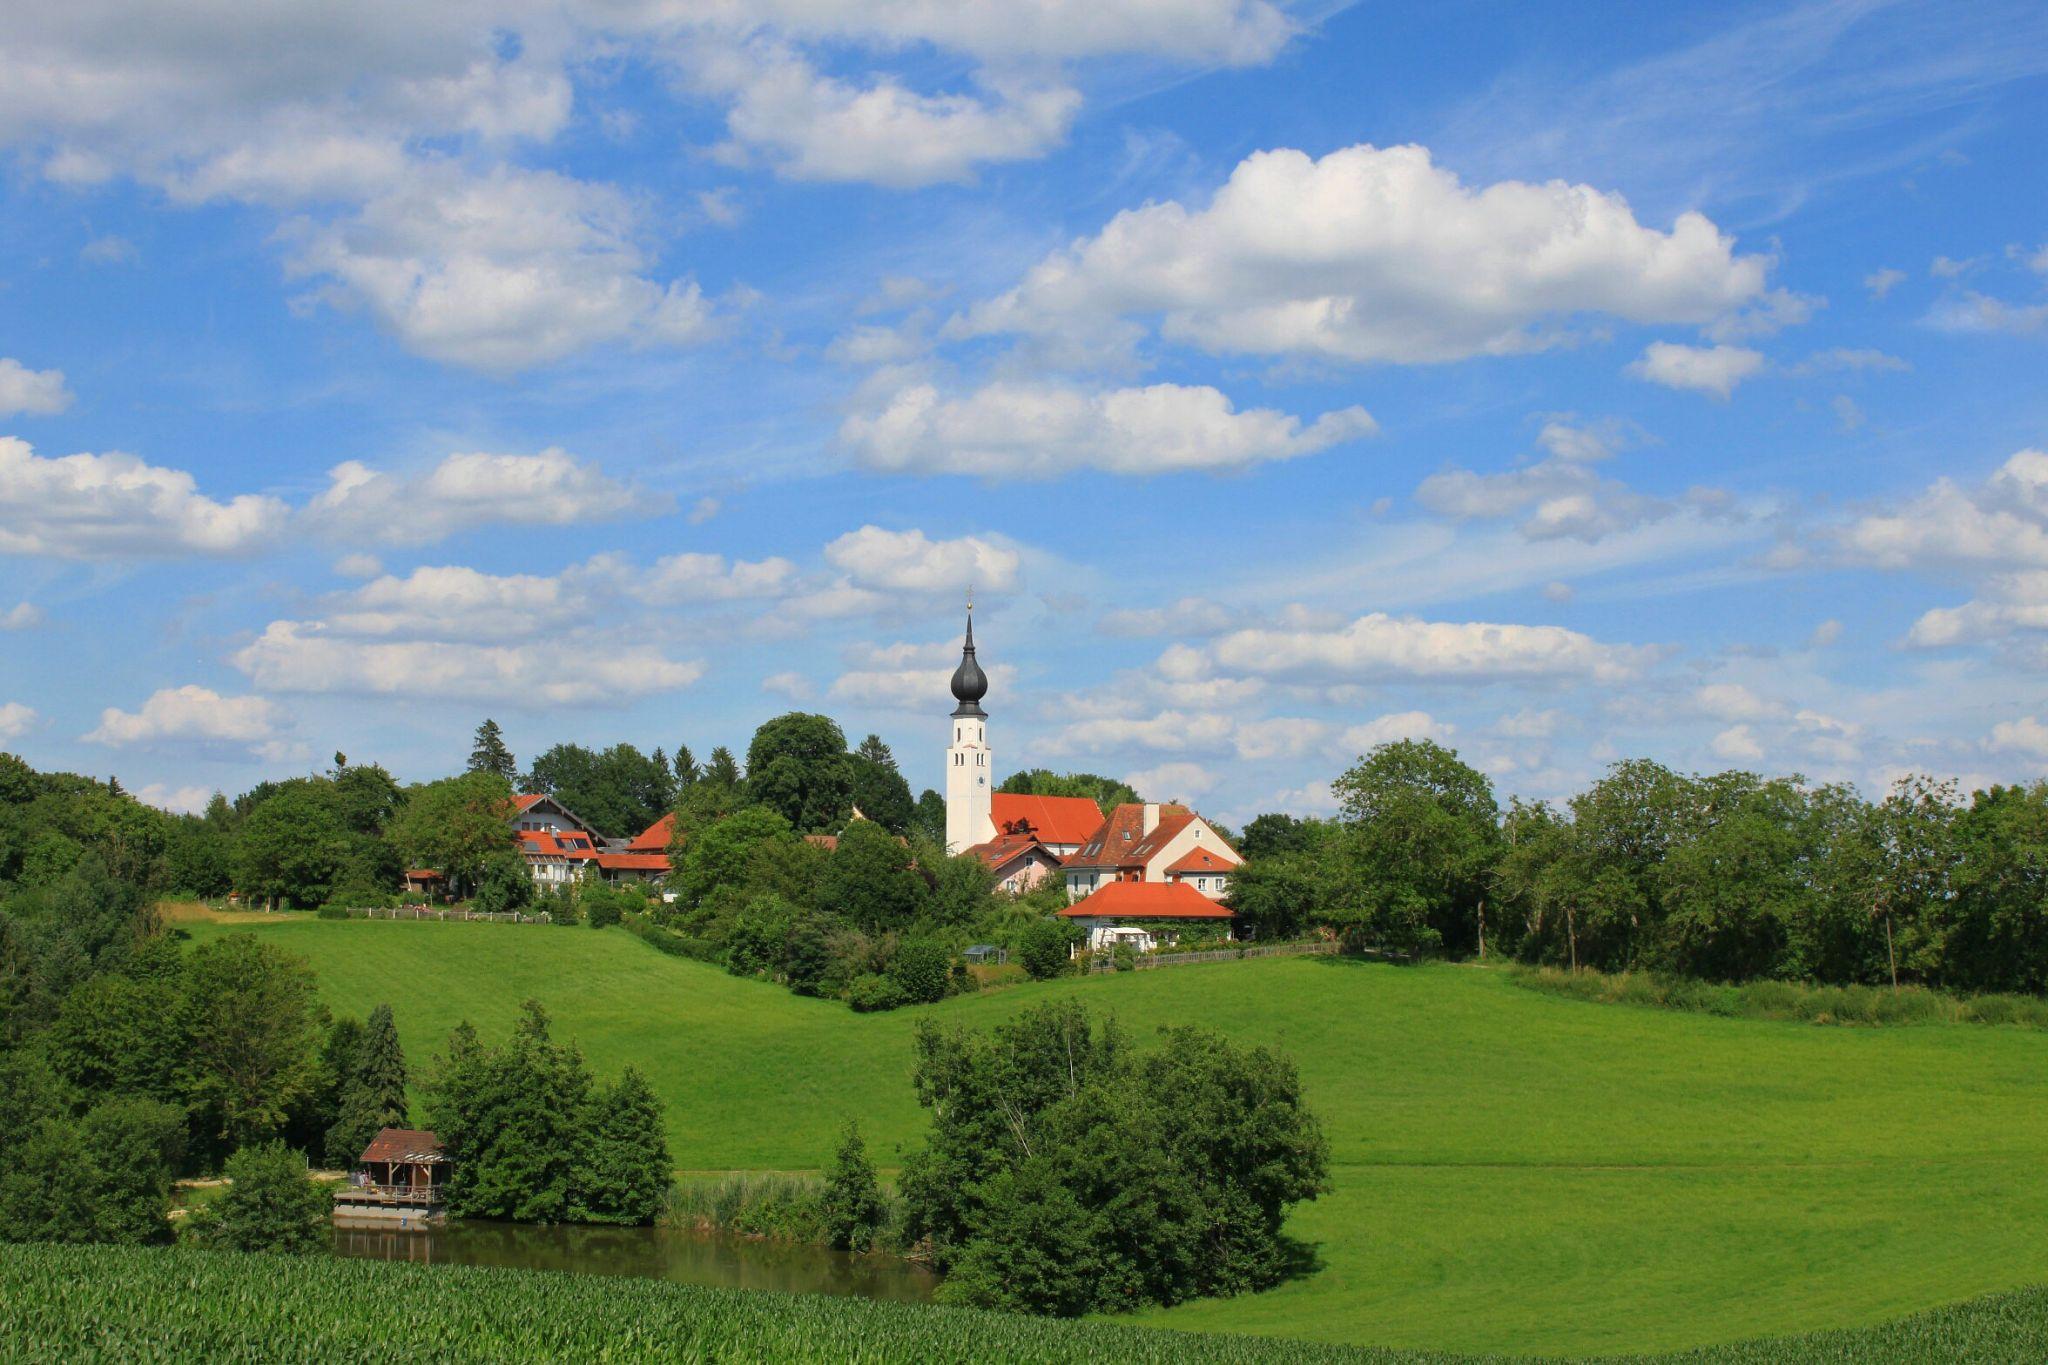 Wallfahrtskirche Heiligenberg, Germany